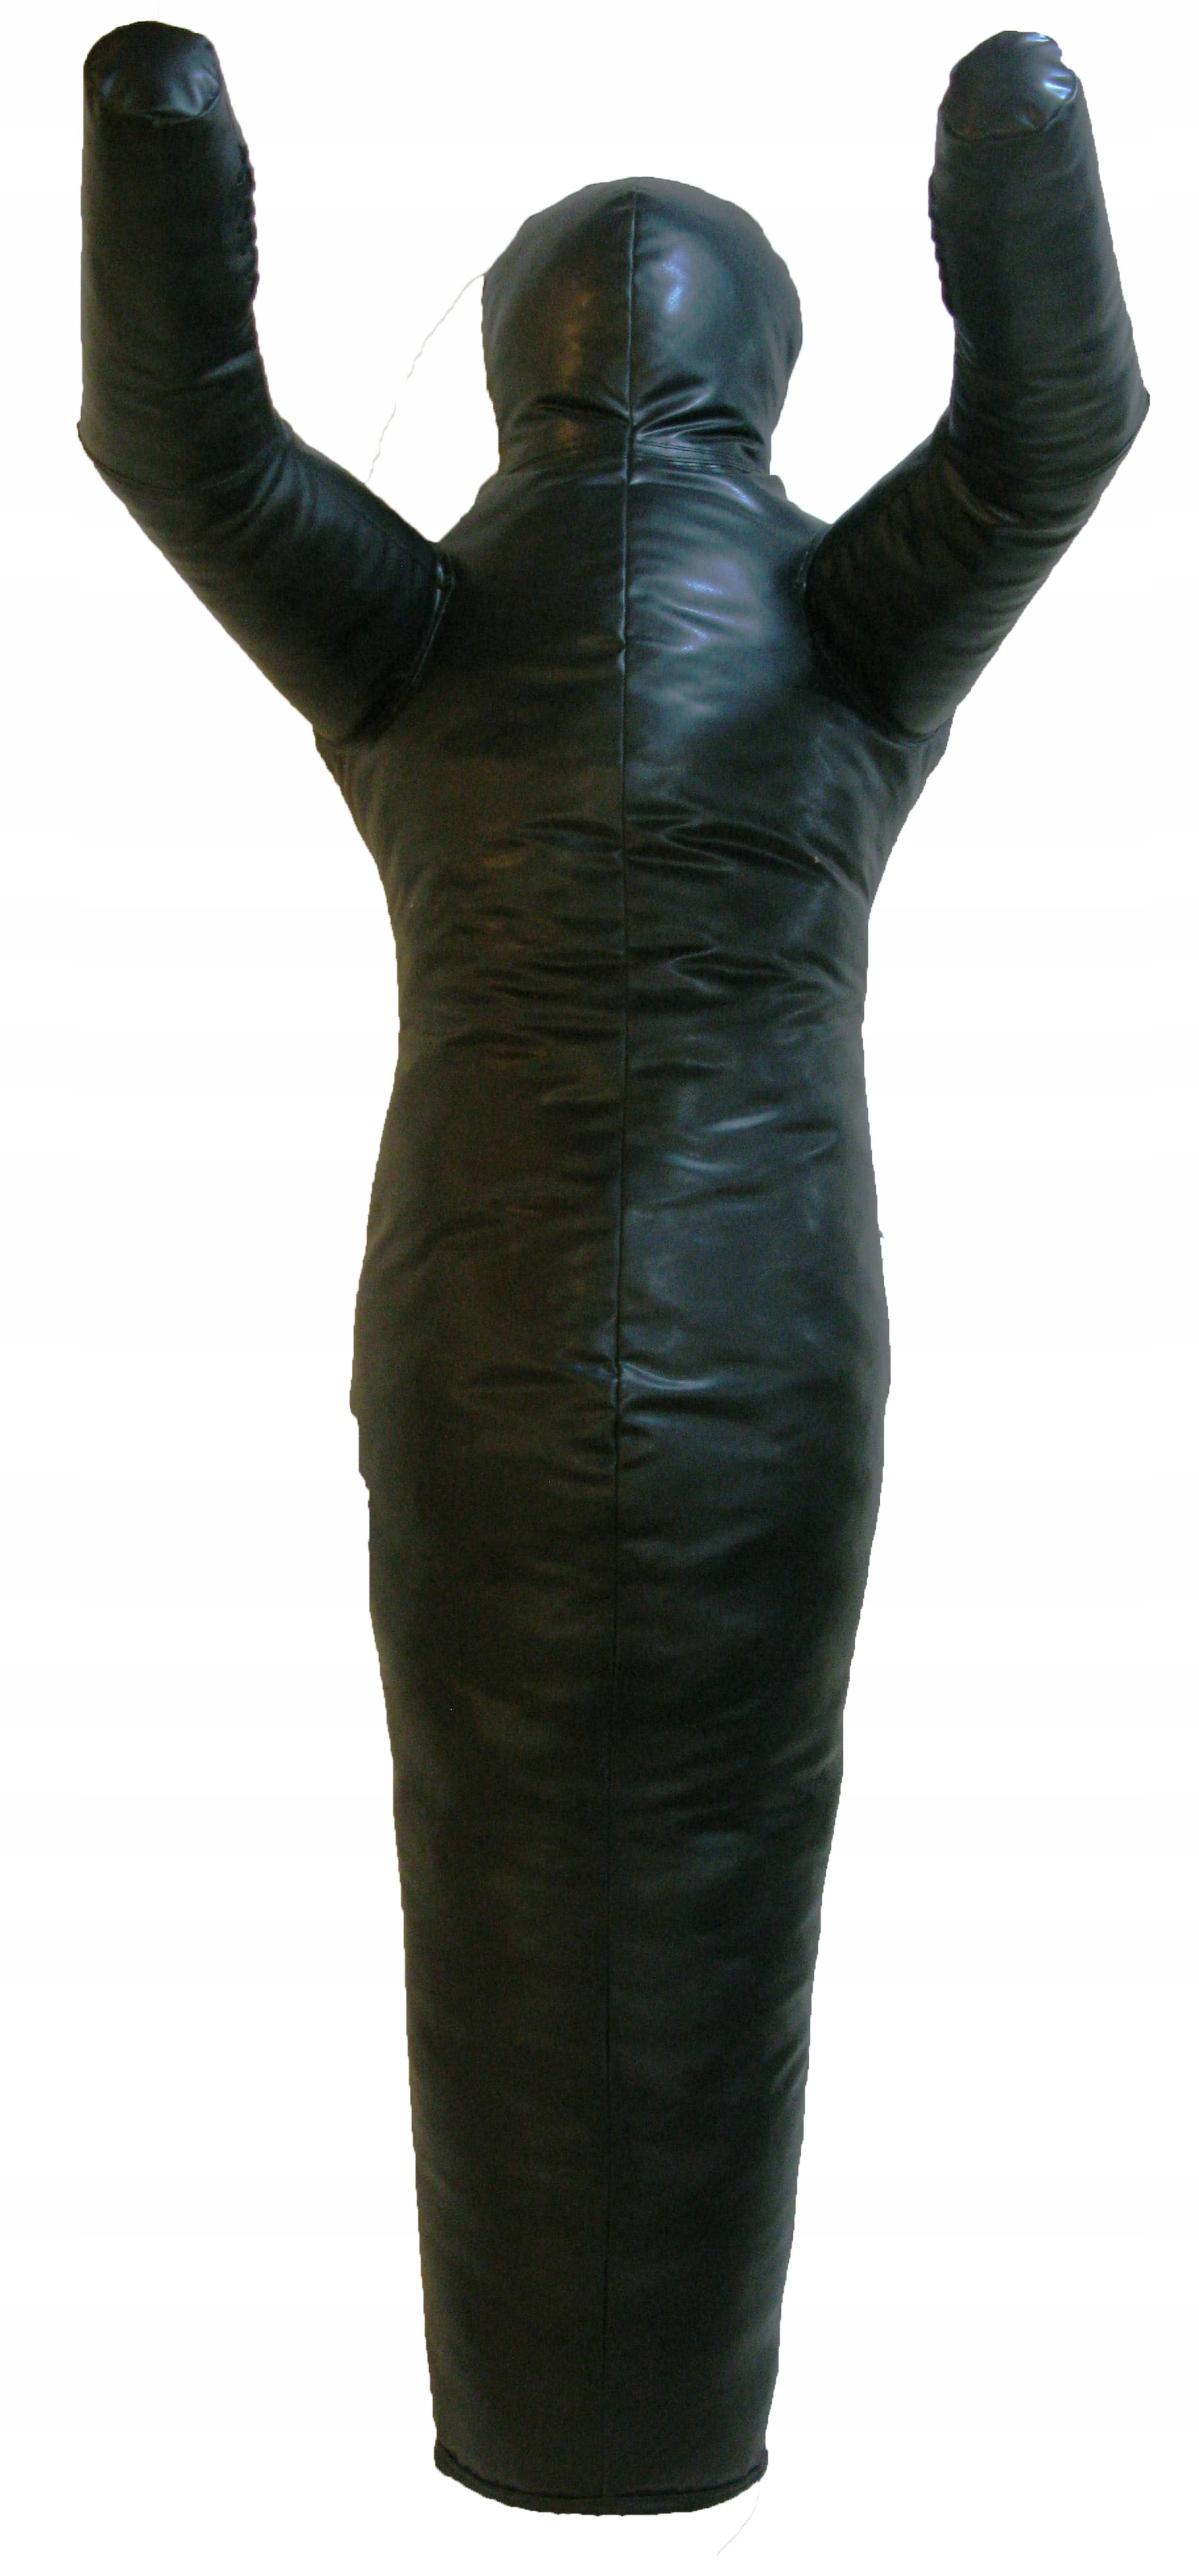 Manekin Wr. 165 cm / 30kg s PVC